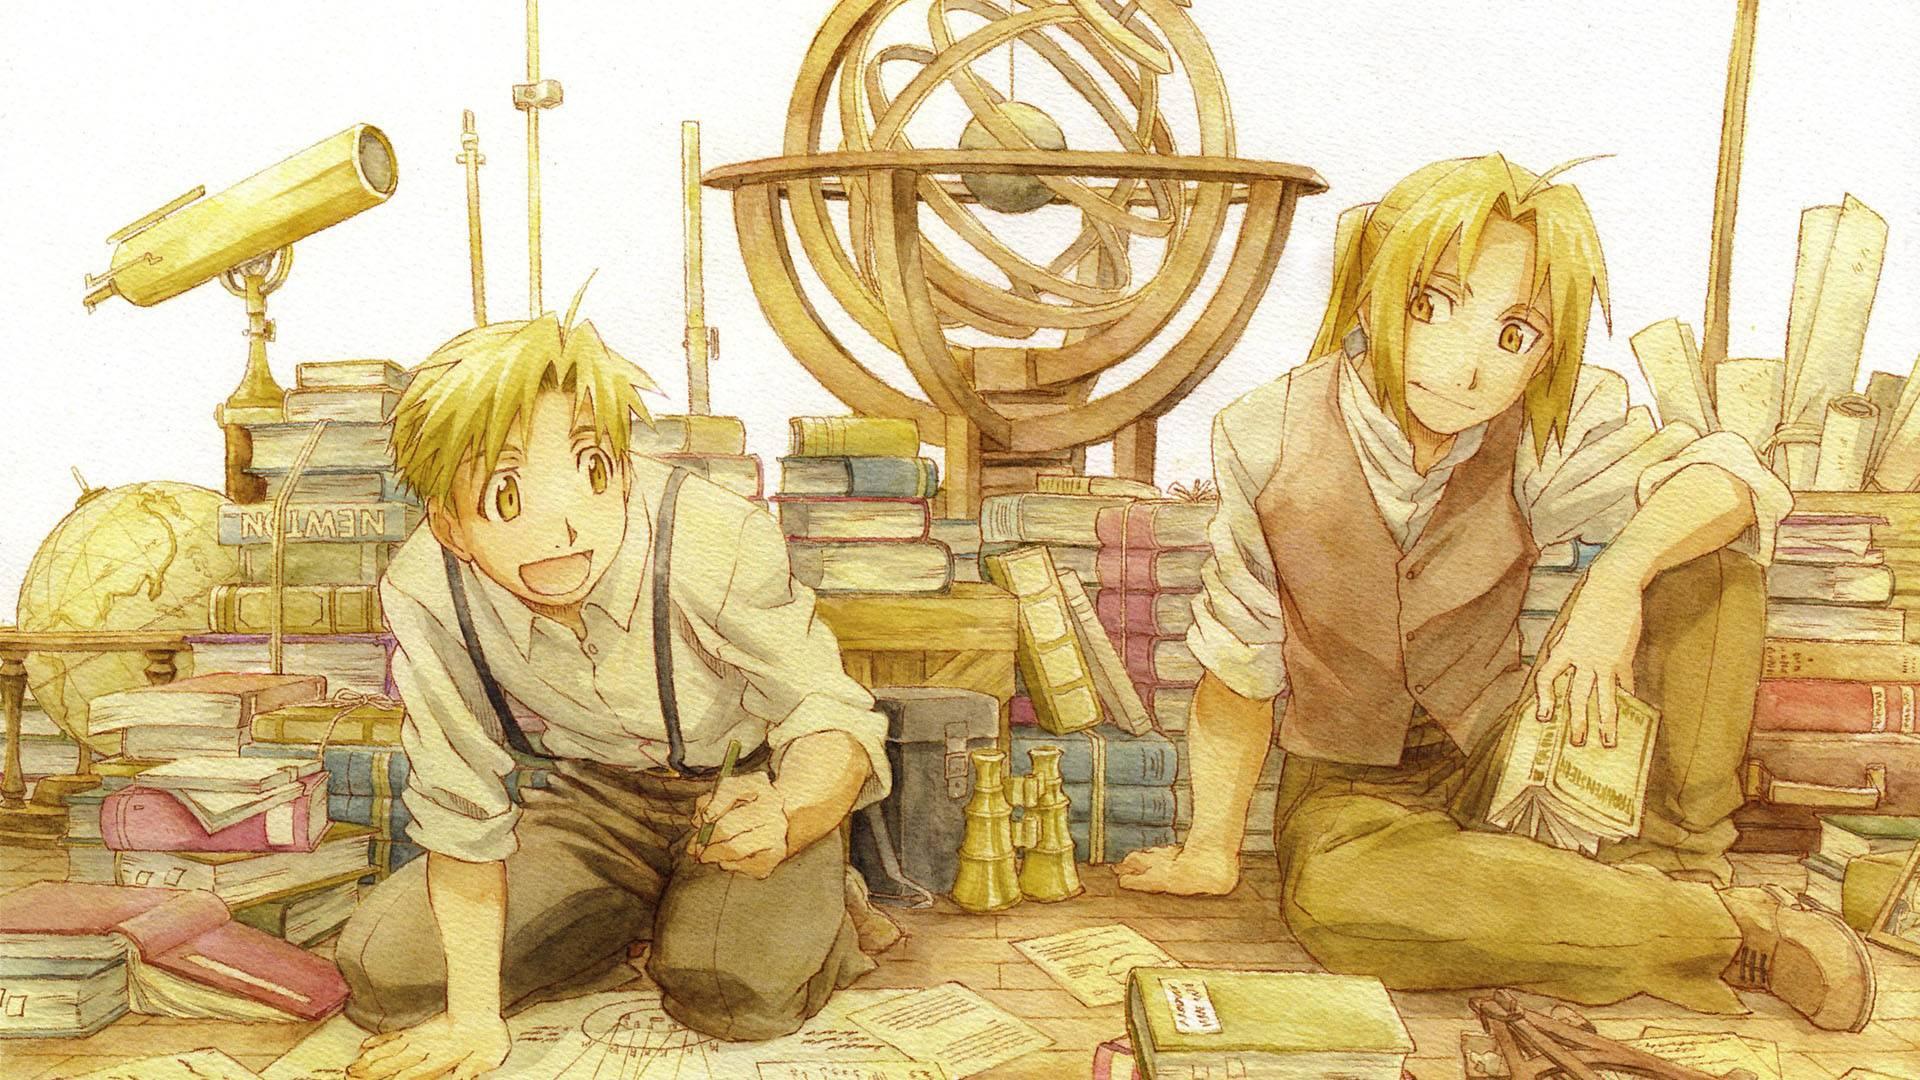 Fullmetal Alchemist: Brotherhood - Anime Wallpapers HD 4K ...